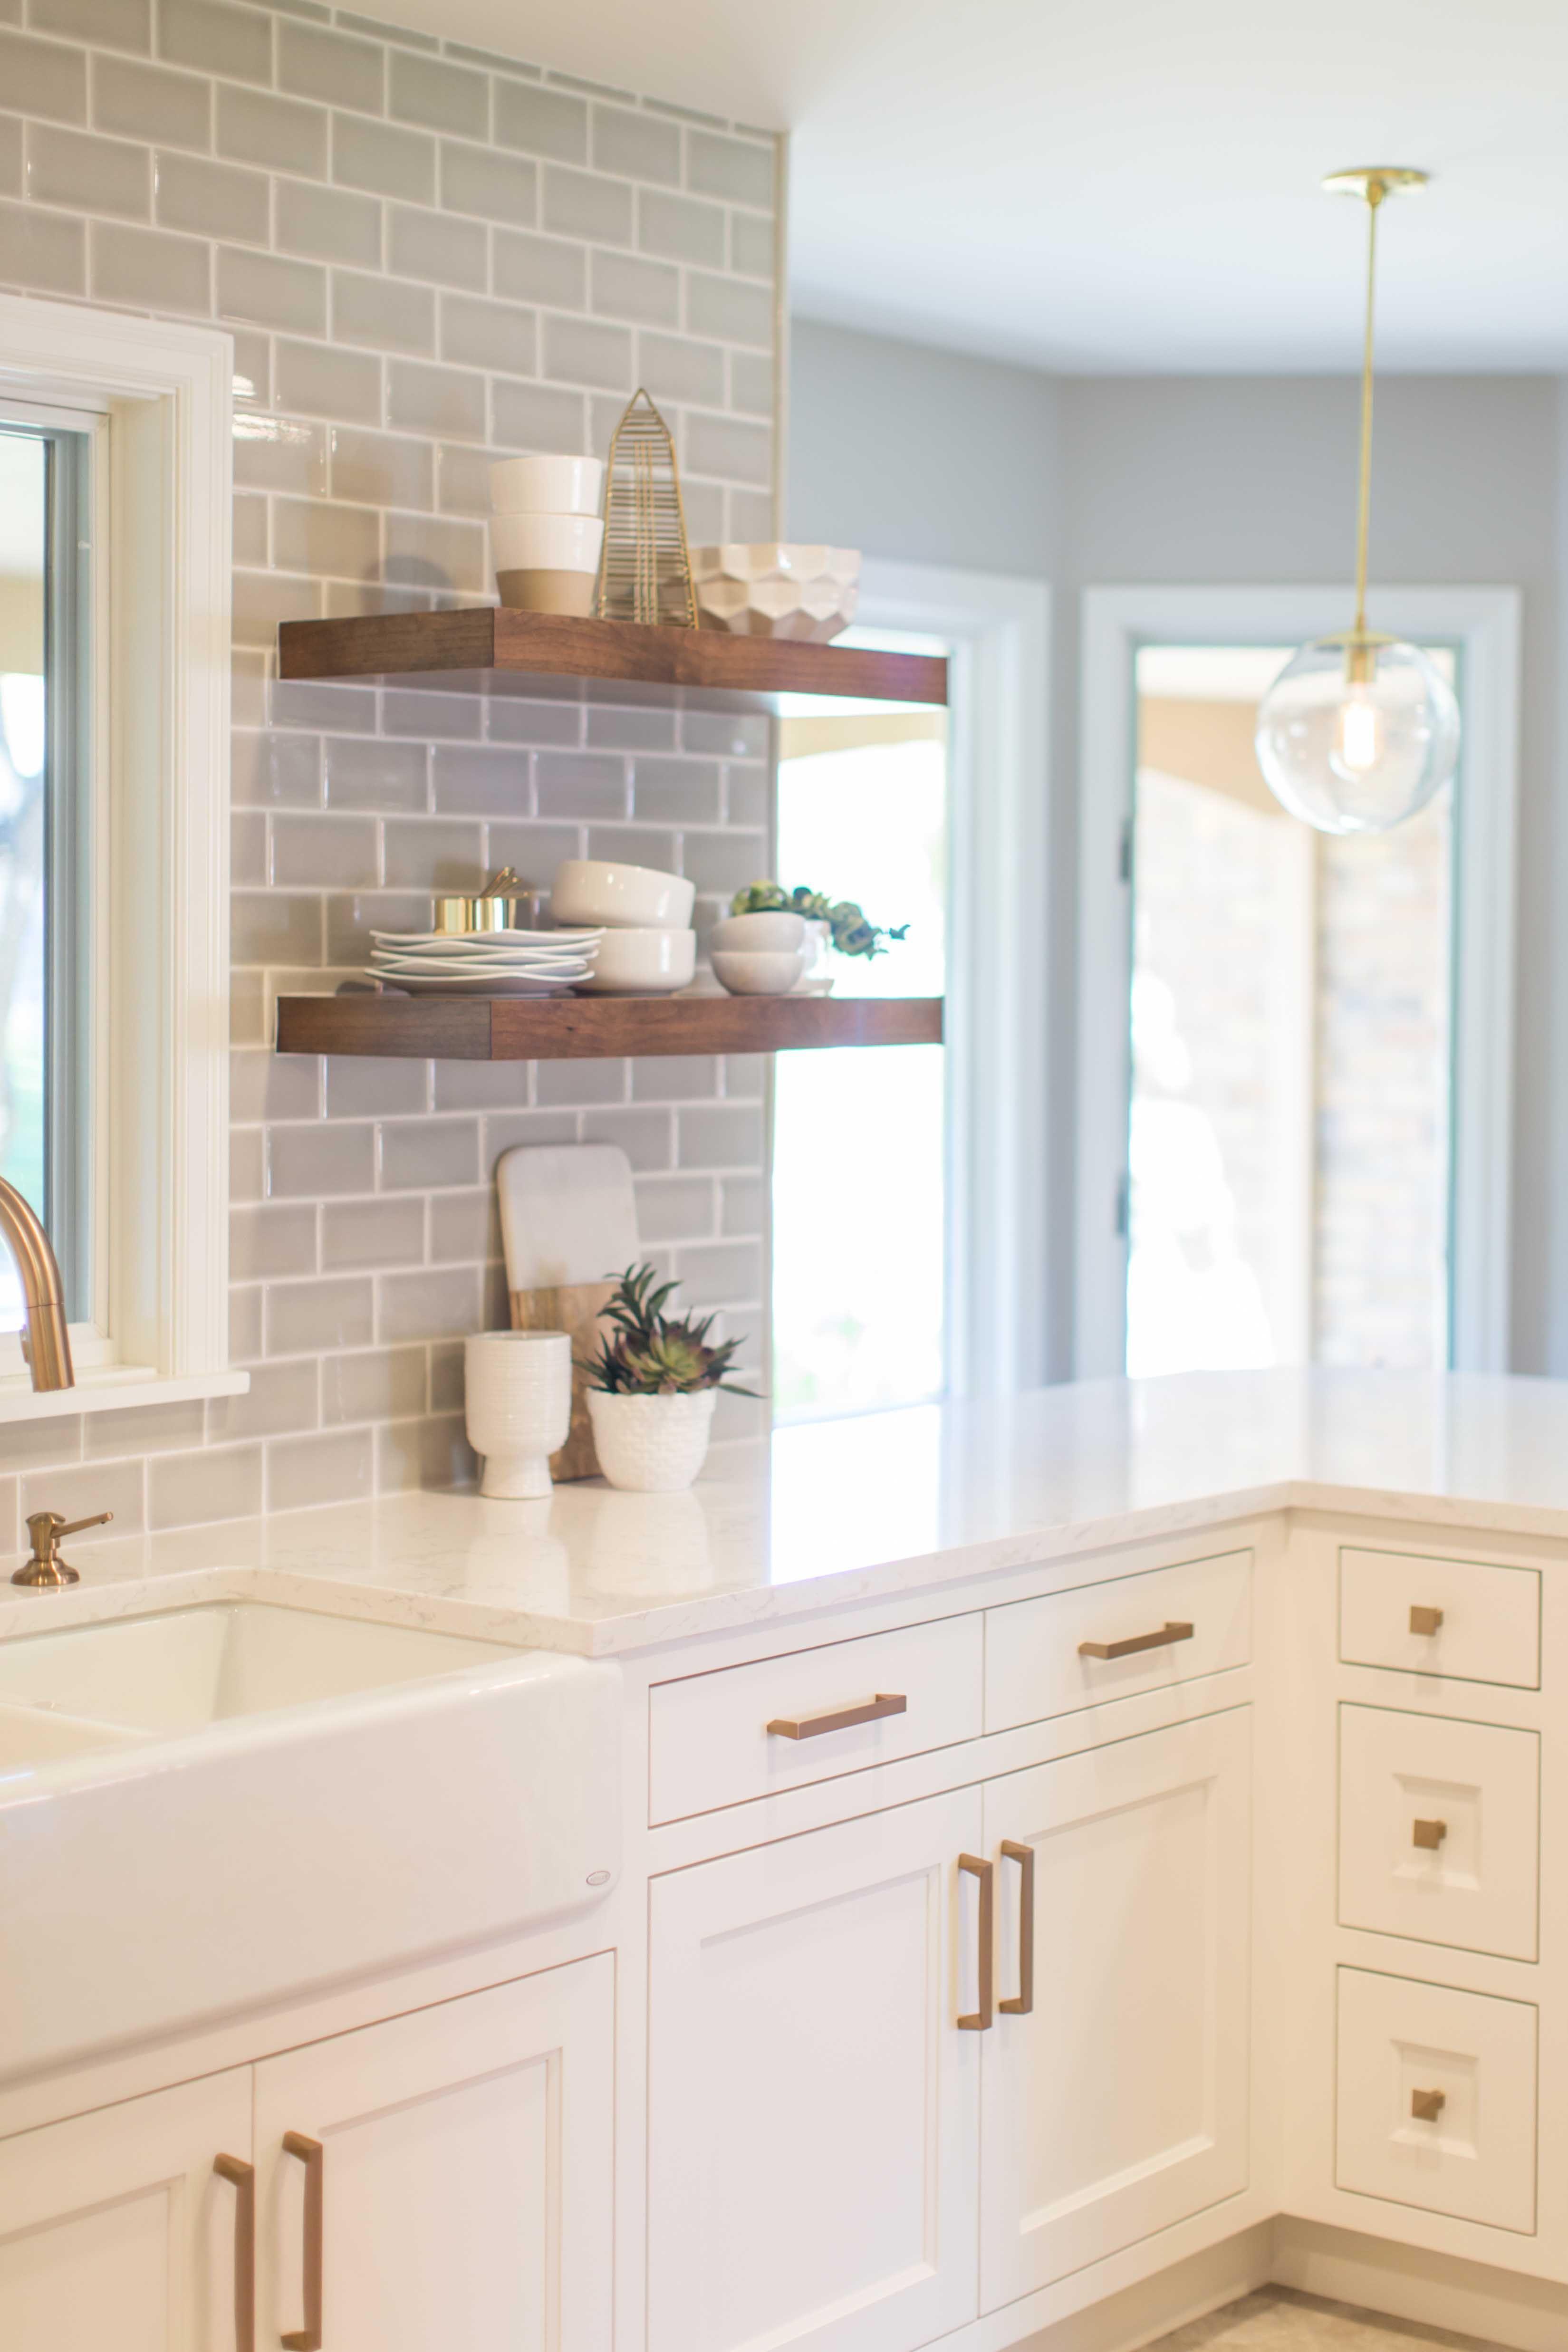 Gorgeous Kitchen Backsplash Decor Ideas 12 Decoria Net Home Kitchens Kitchen Renovation Kitchen Design